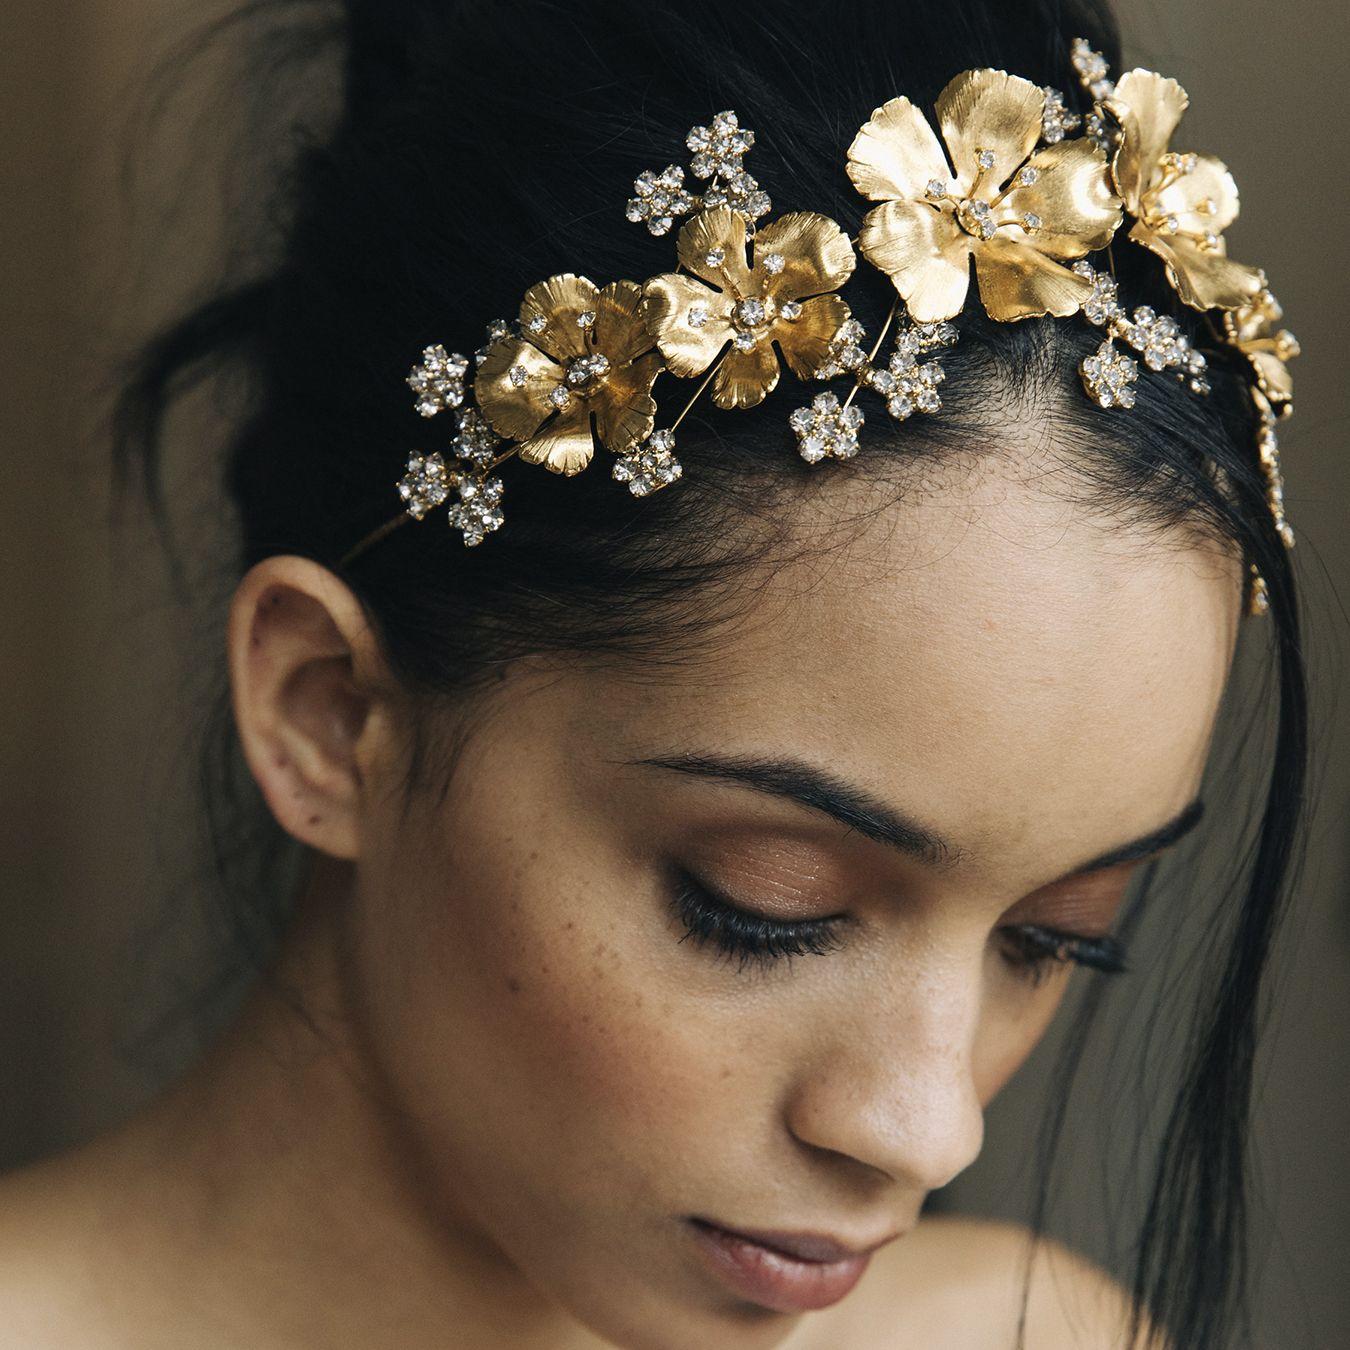 The viola circlet takes flower crowns to a whole new level adorn the viola circlet takes flower crowns to a whole new level adorn your wedding hairstyle izmirmasajfo